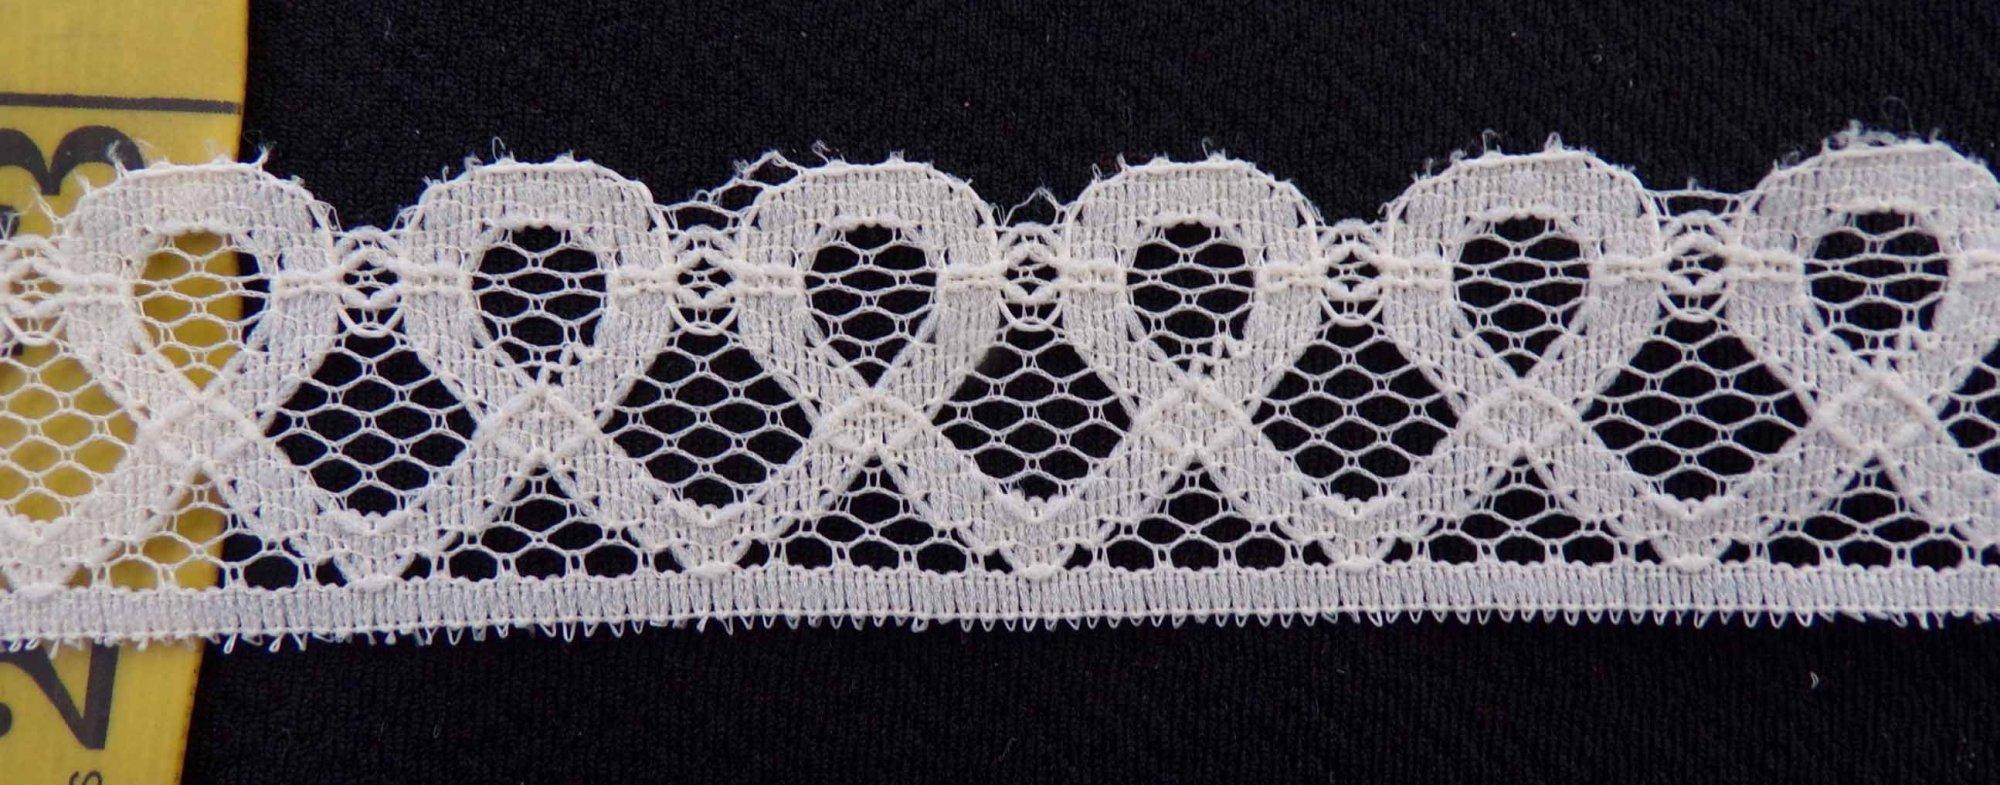 1 Rigid Lace - Ivory